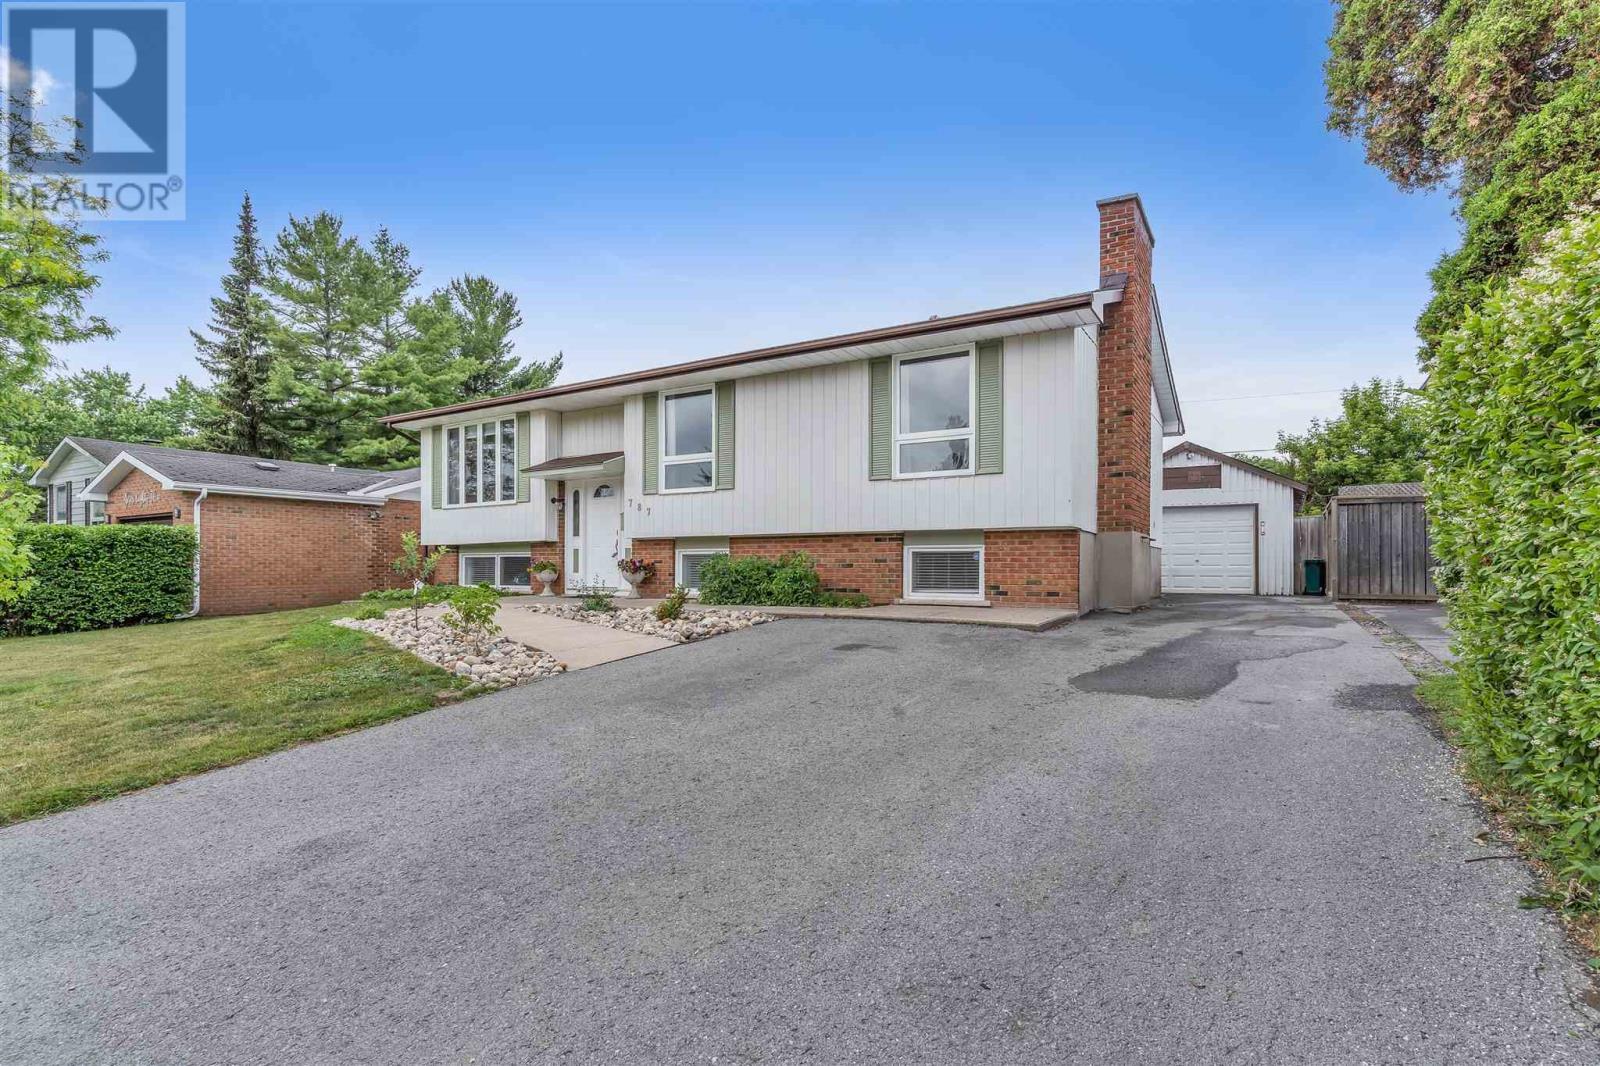 Property Listing: 787 Butternut St, Kingston, Ontario